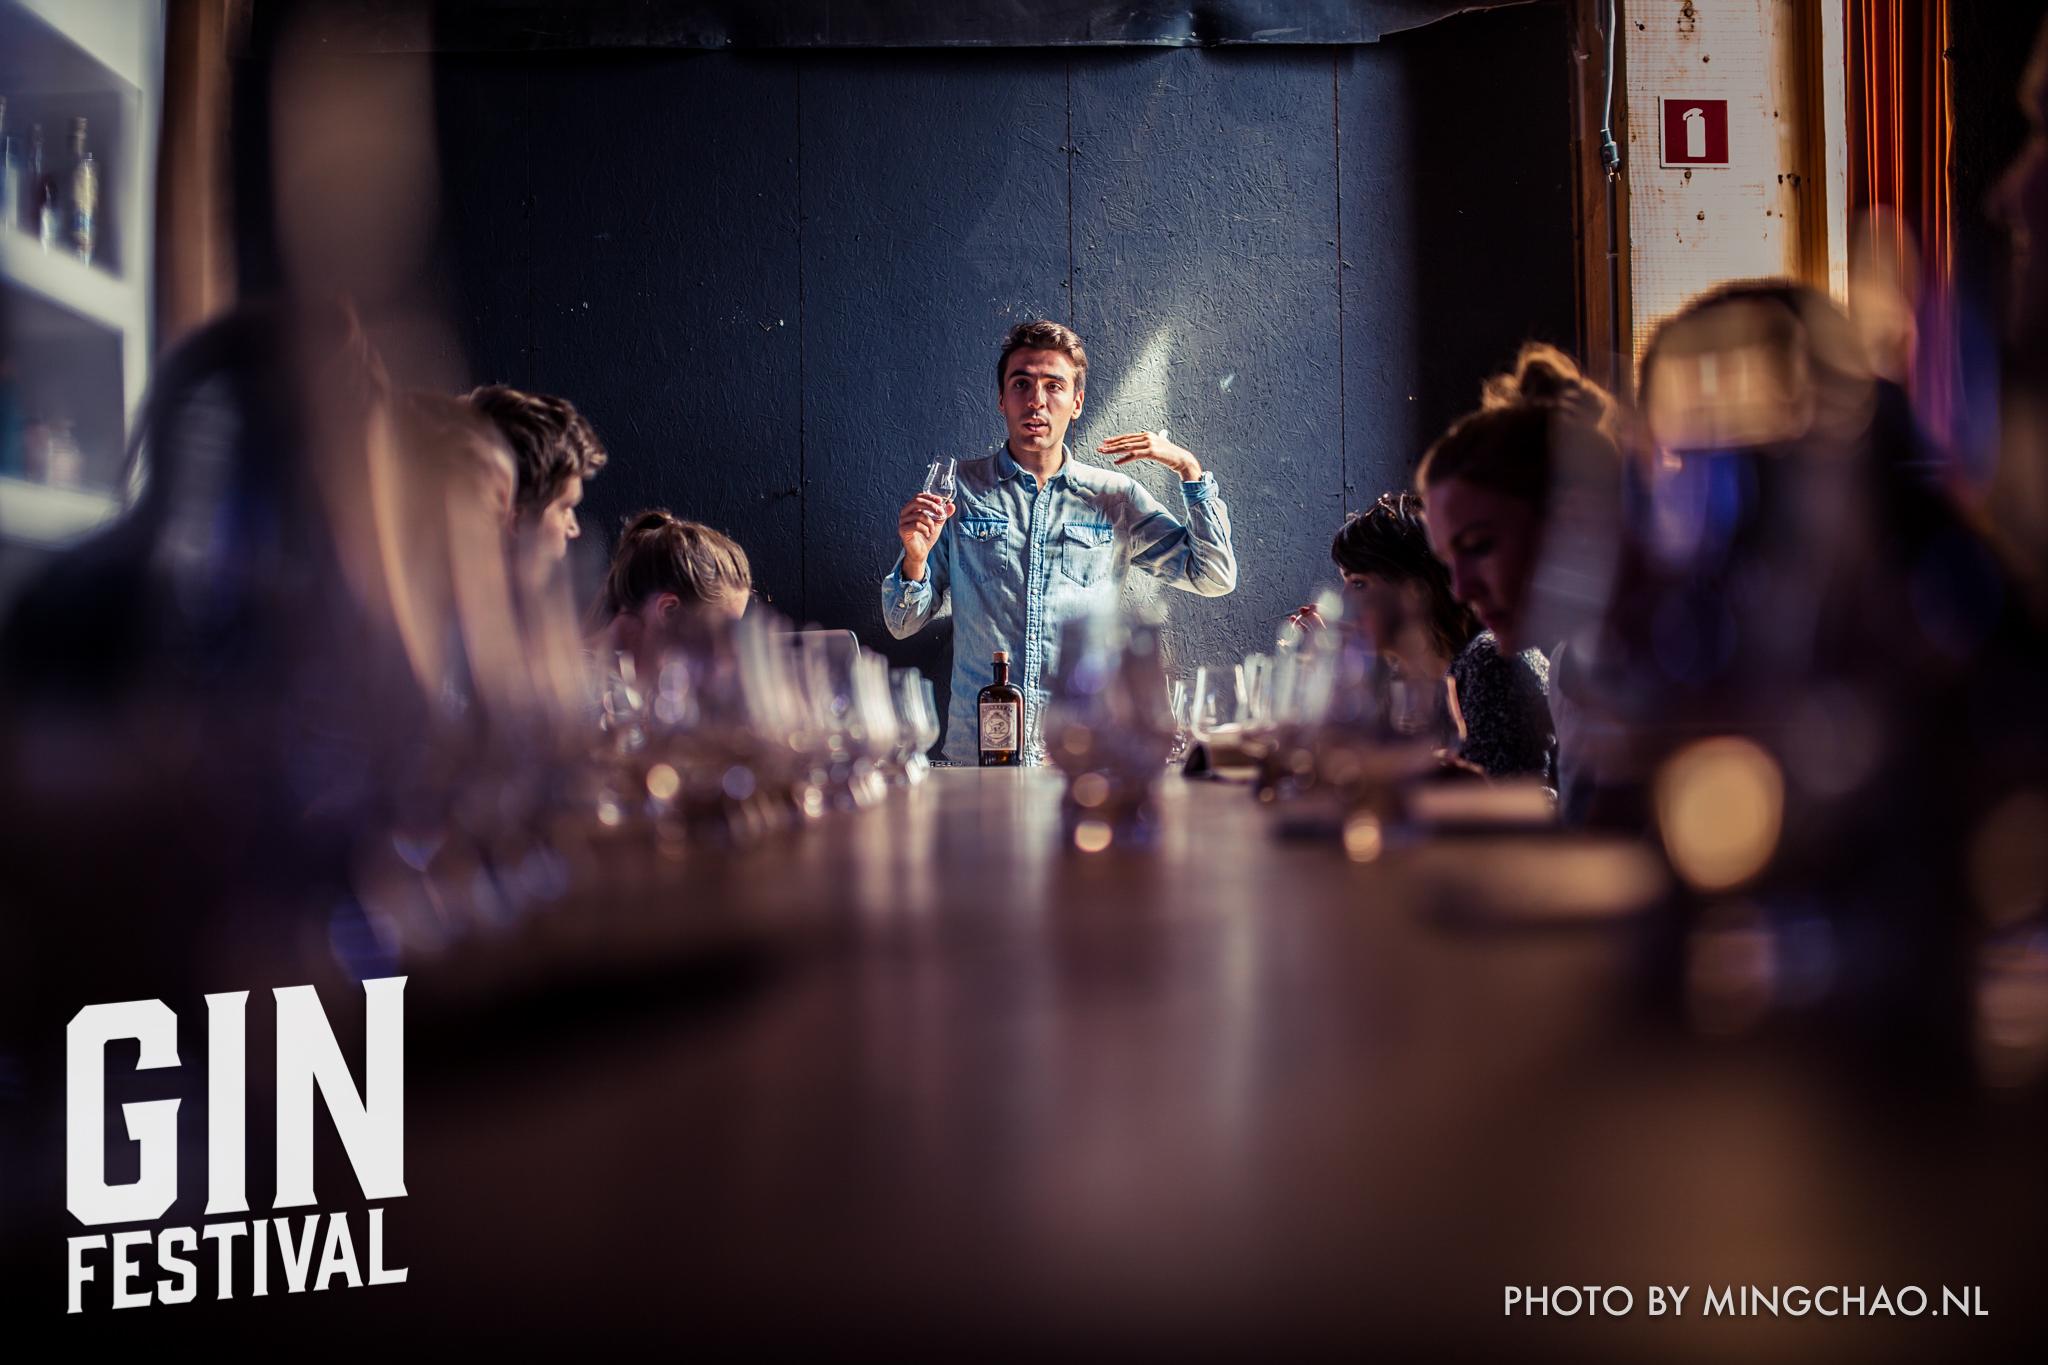 gin-festival-proeverij-manman